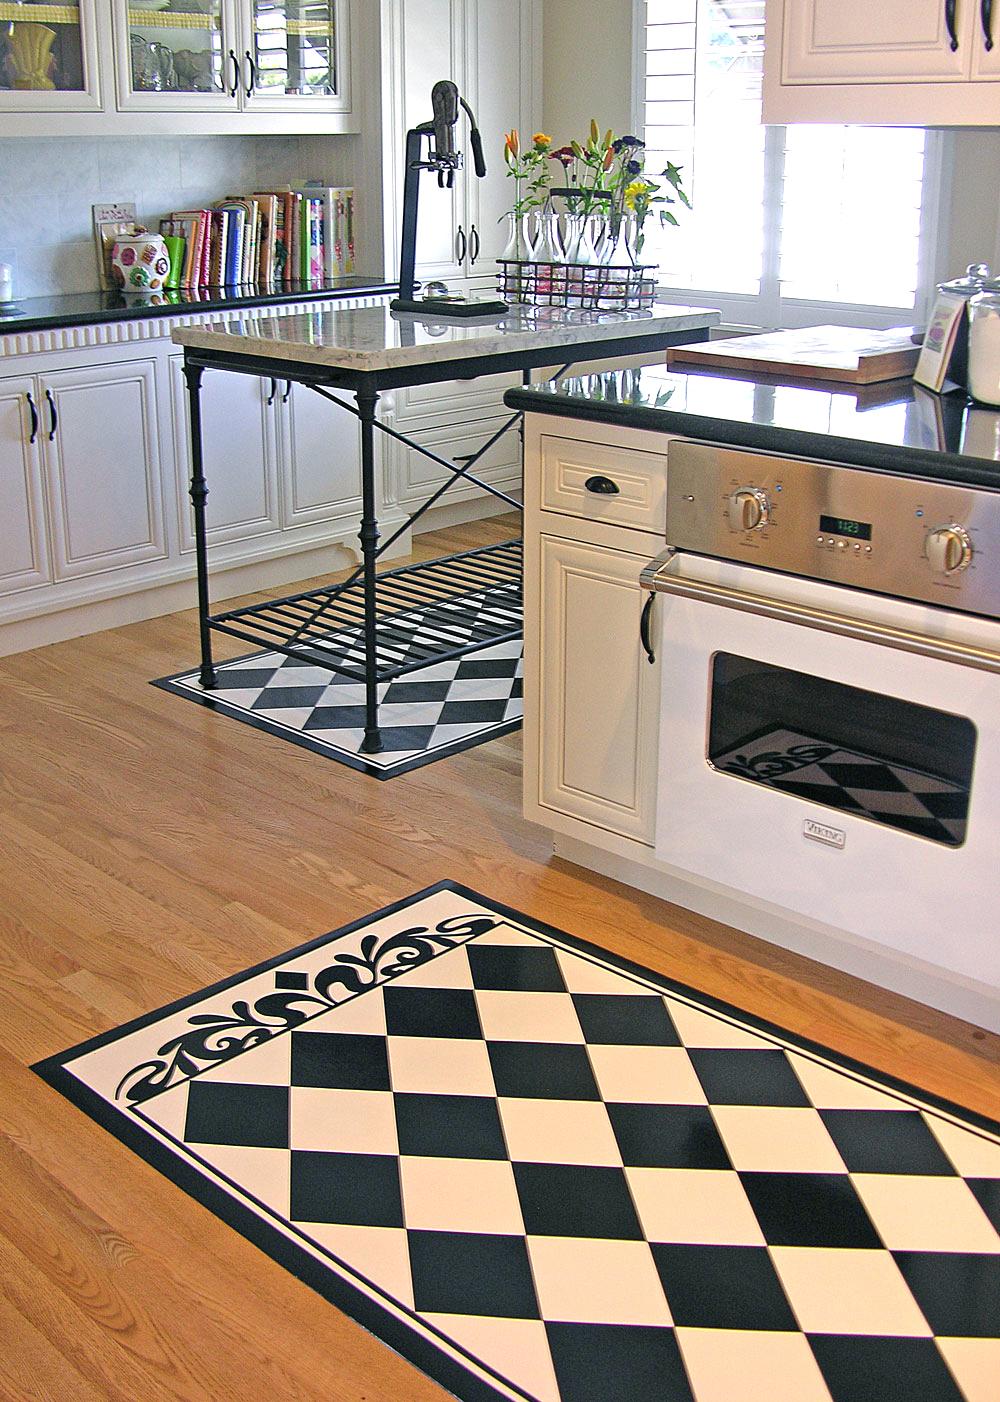 fun kitchen floor mats pic1 pic2 47